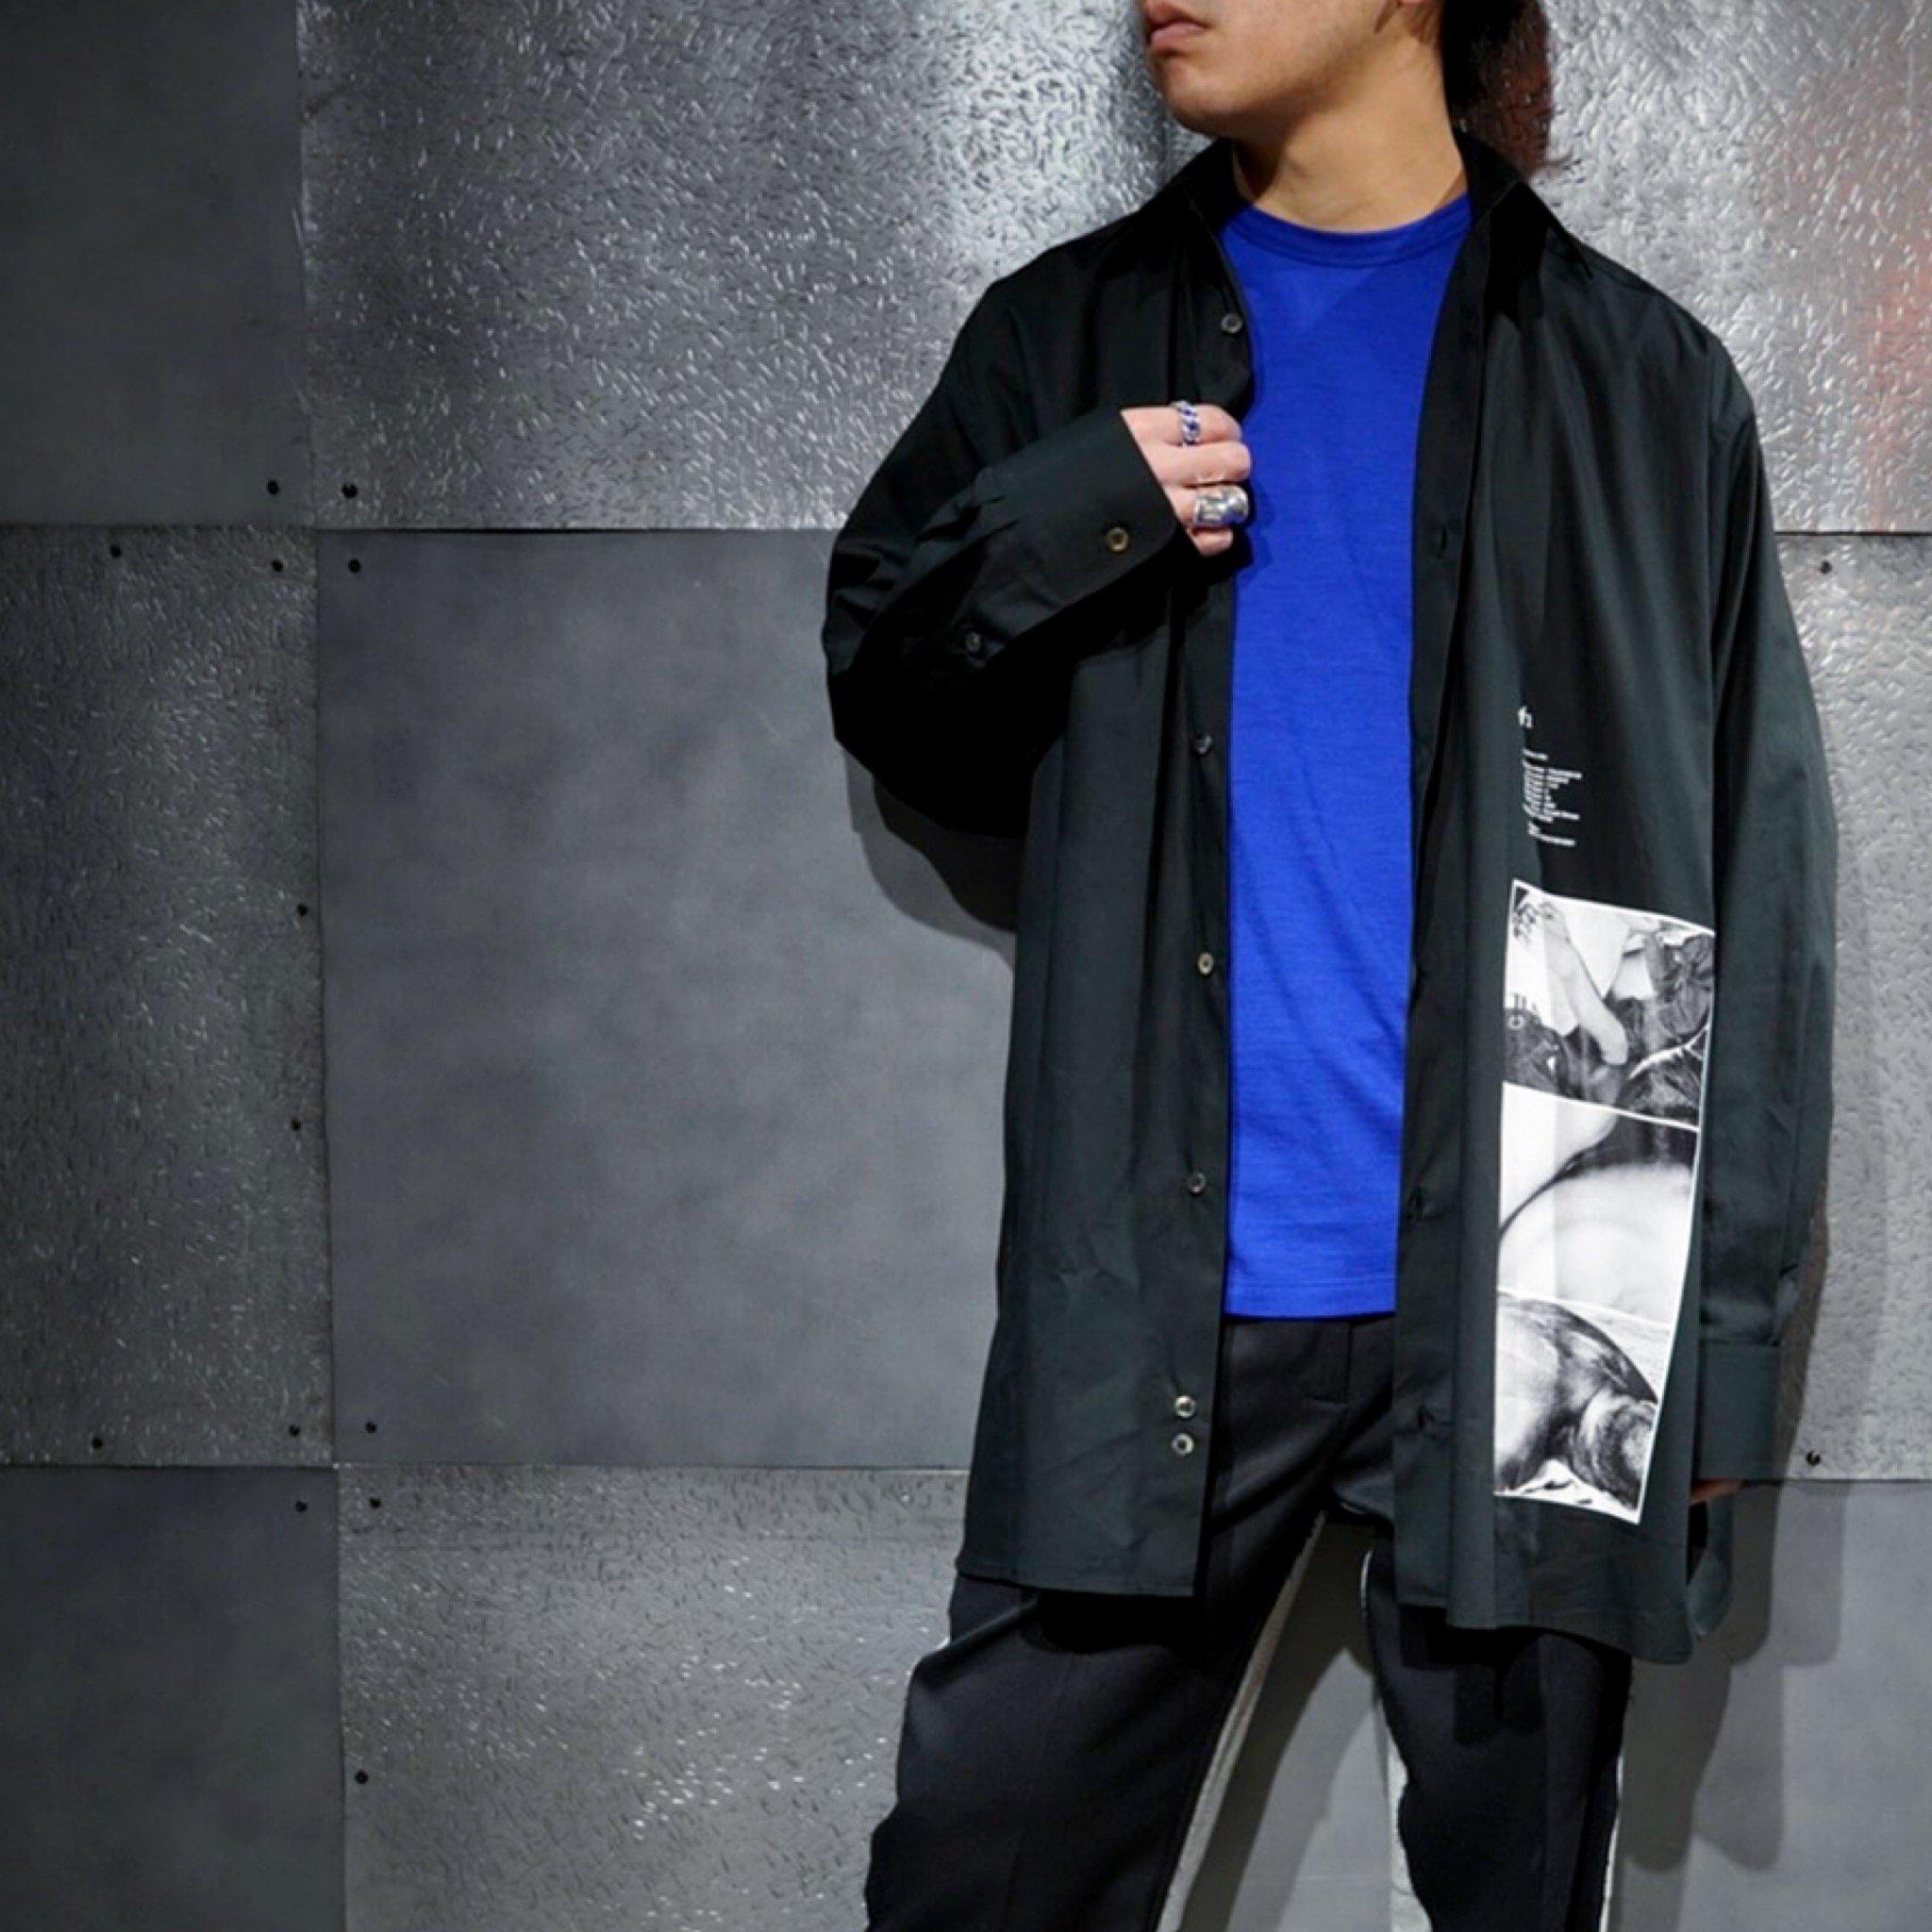 【TH】Ronald Stoopsグラフィックプリント<BR>オーバーサイズシャツ